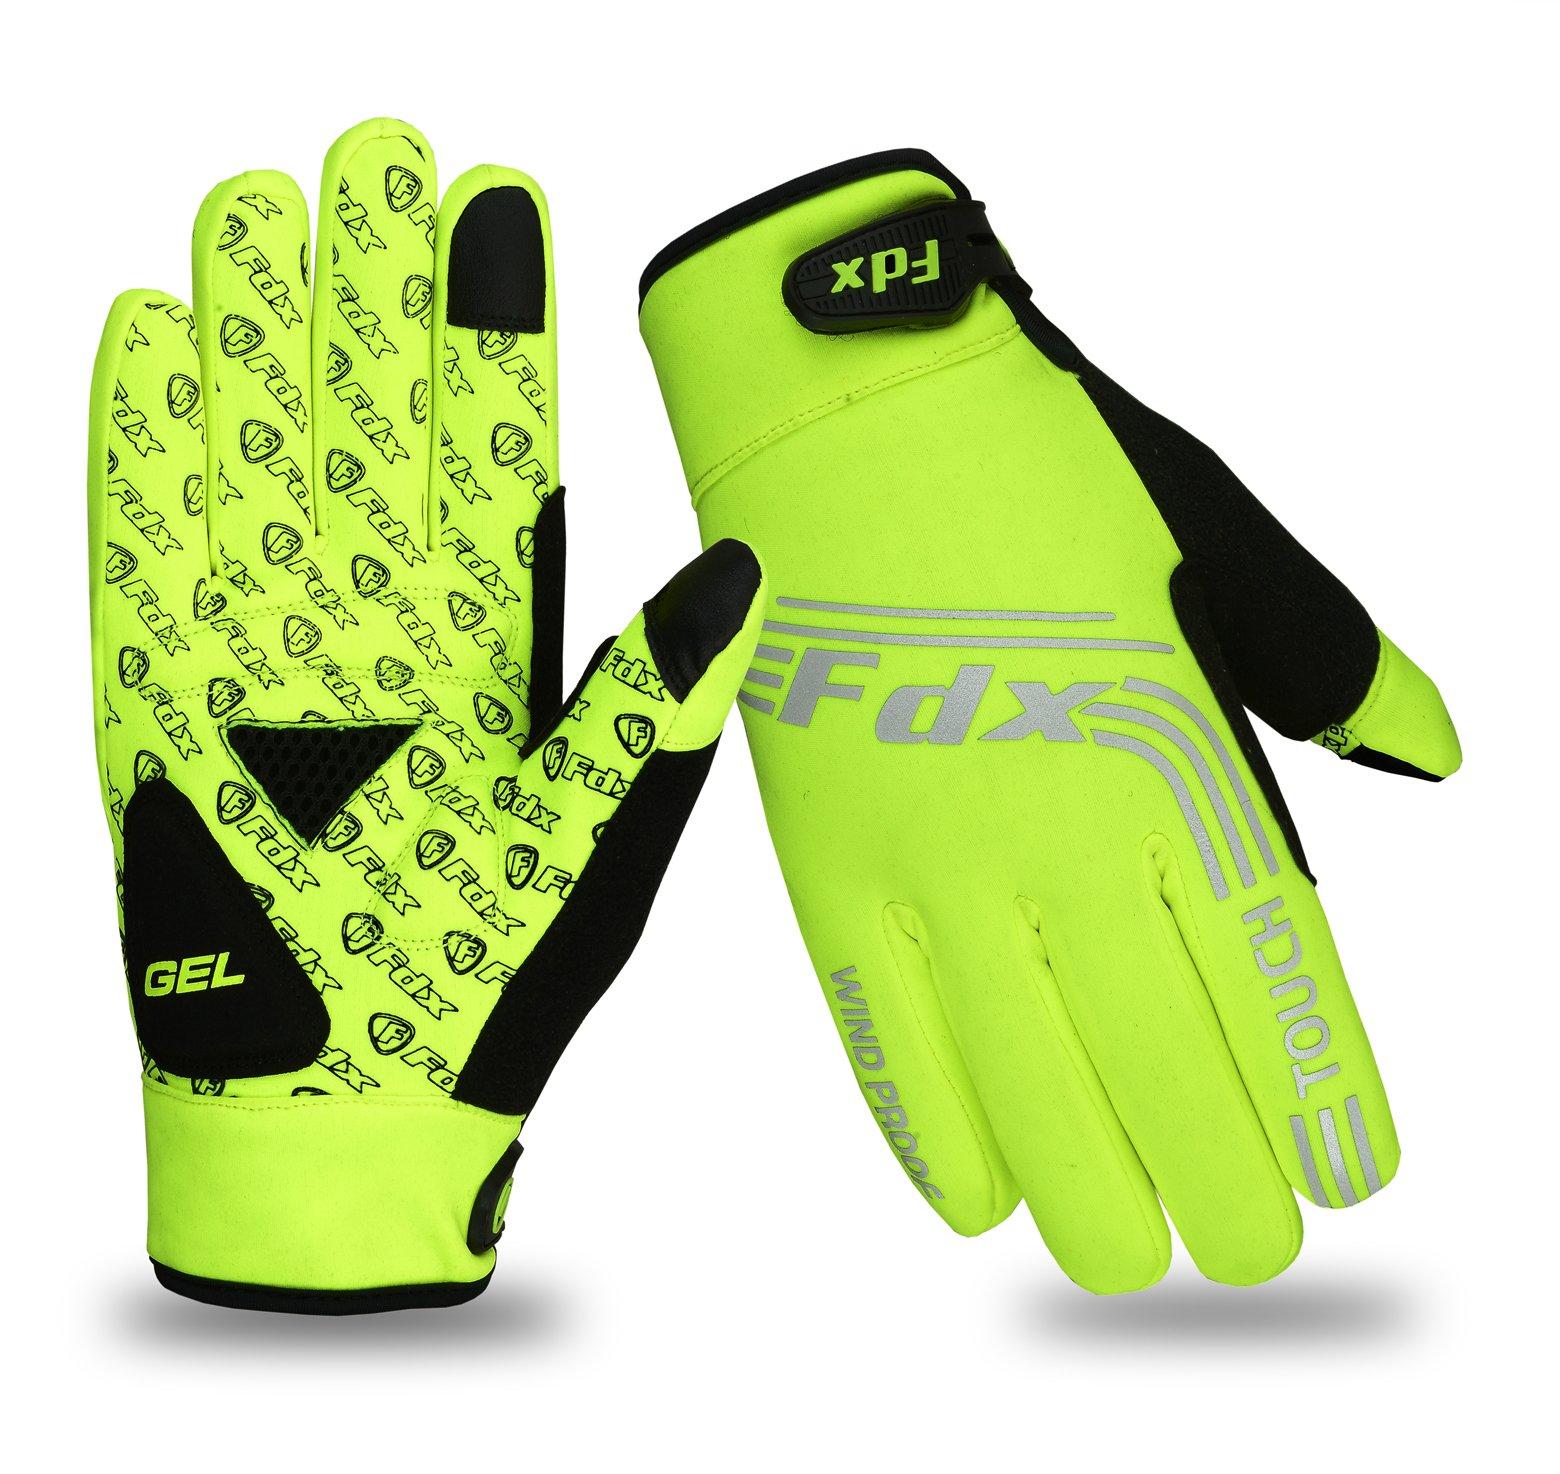 FDX Cycling Gloves Windproof Gel Padded Touchscreen  Full Finger Biking Gloves